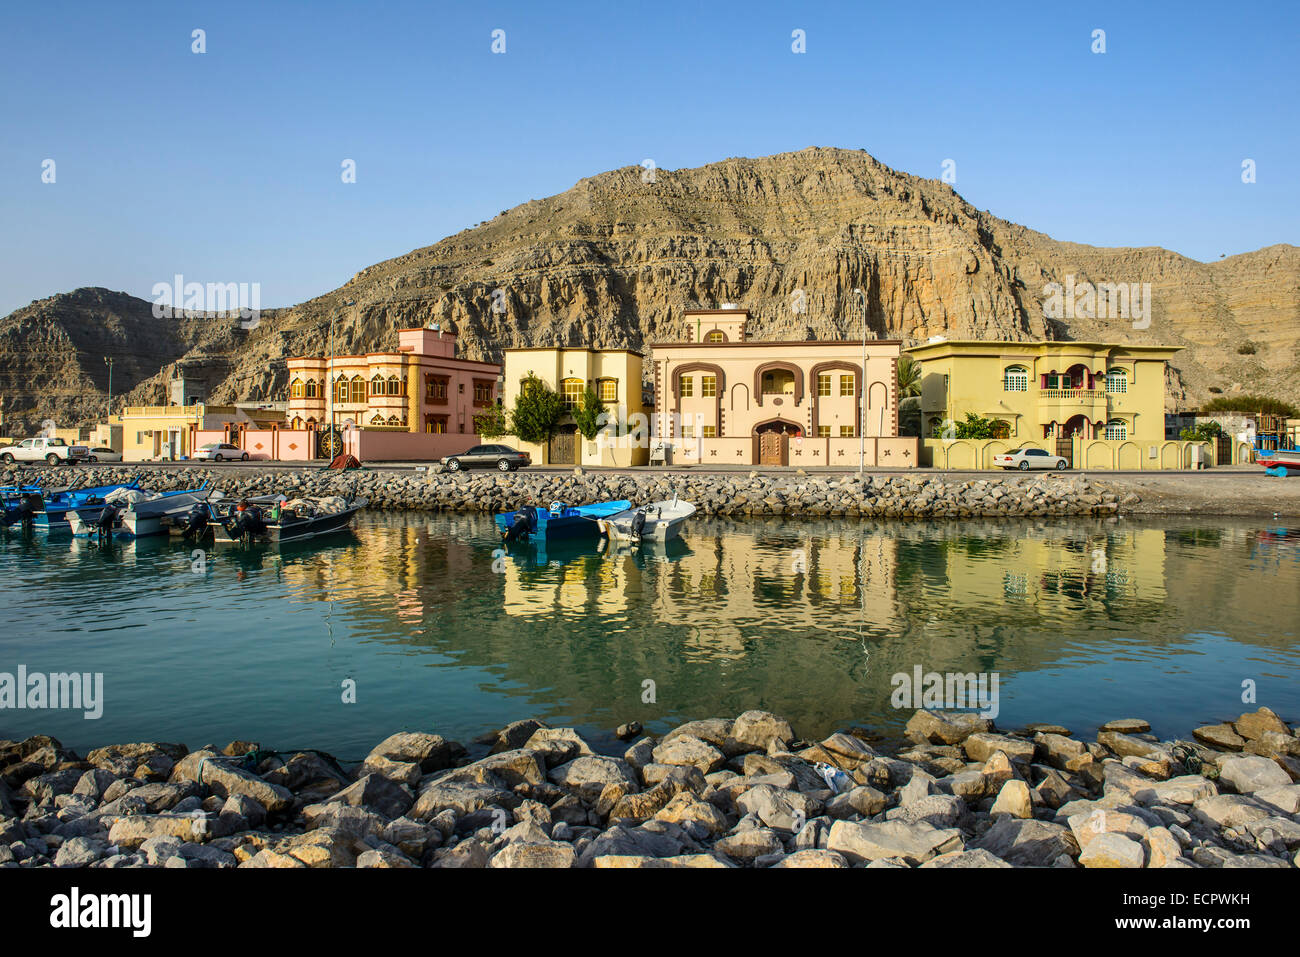 Case sull'acqua, Khasab, Musandam, Oman Immagini Stock